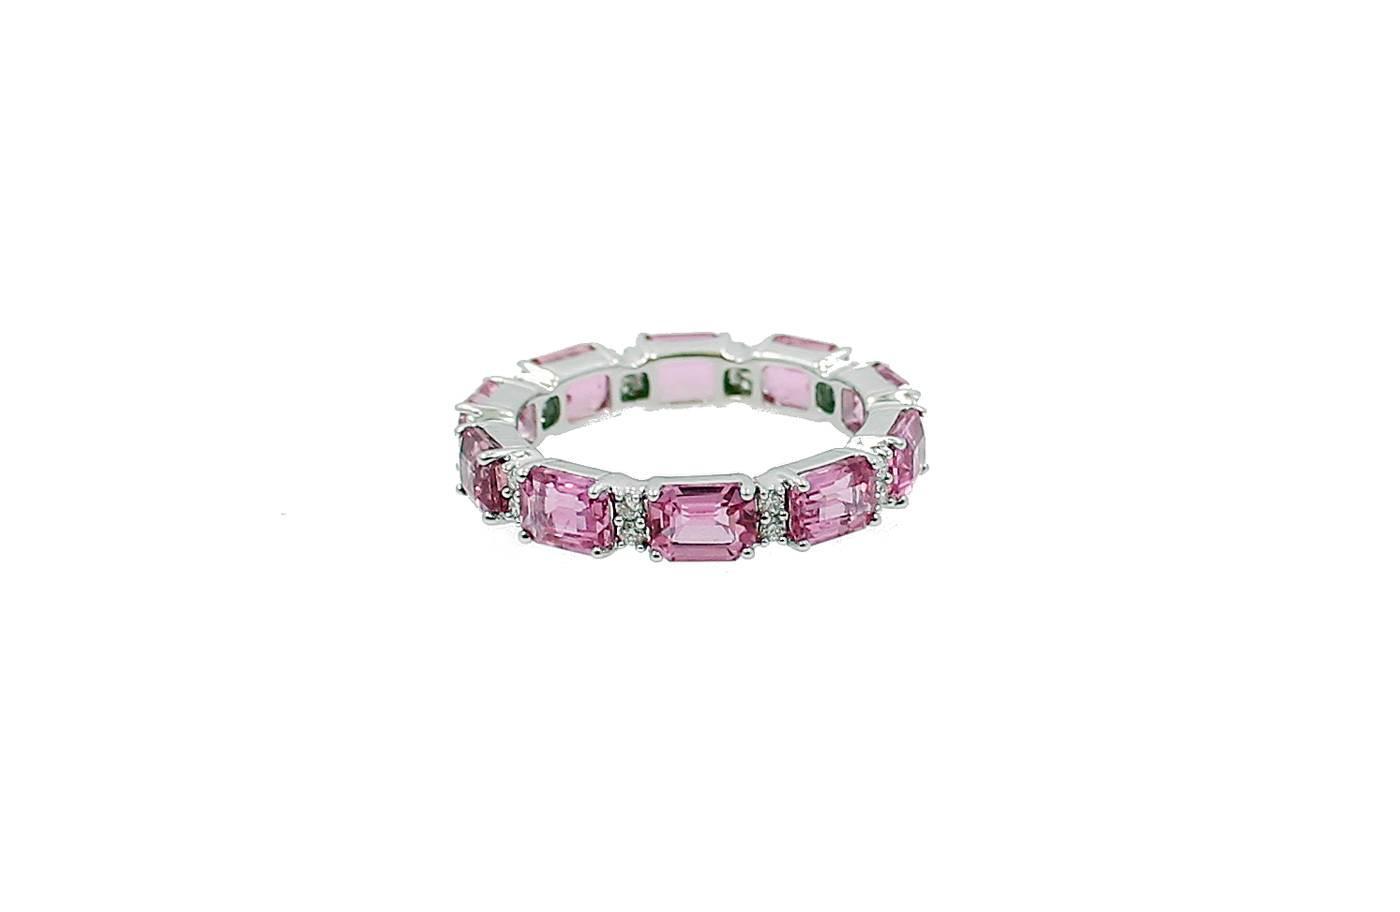 Emerald Cut Pink Sapphire Diamond Gold Eternity Band Ring